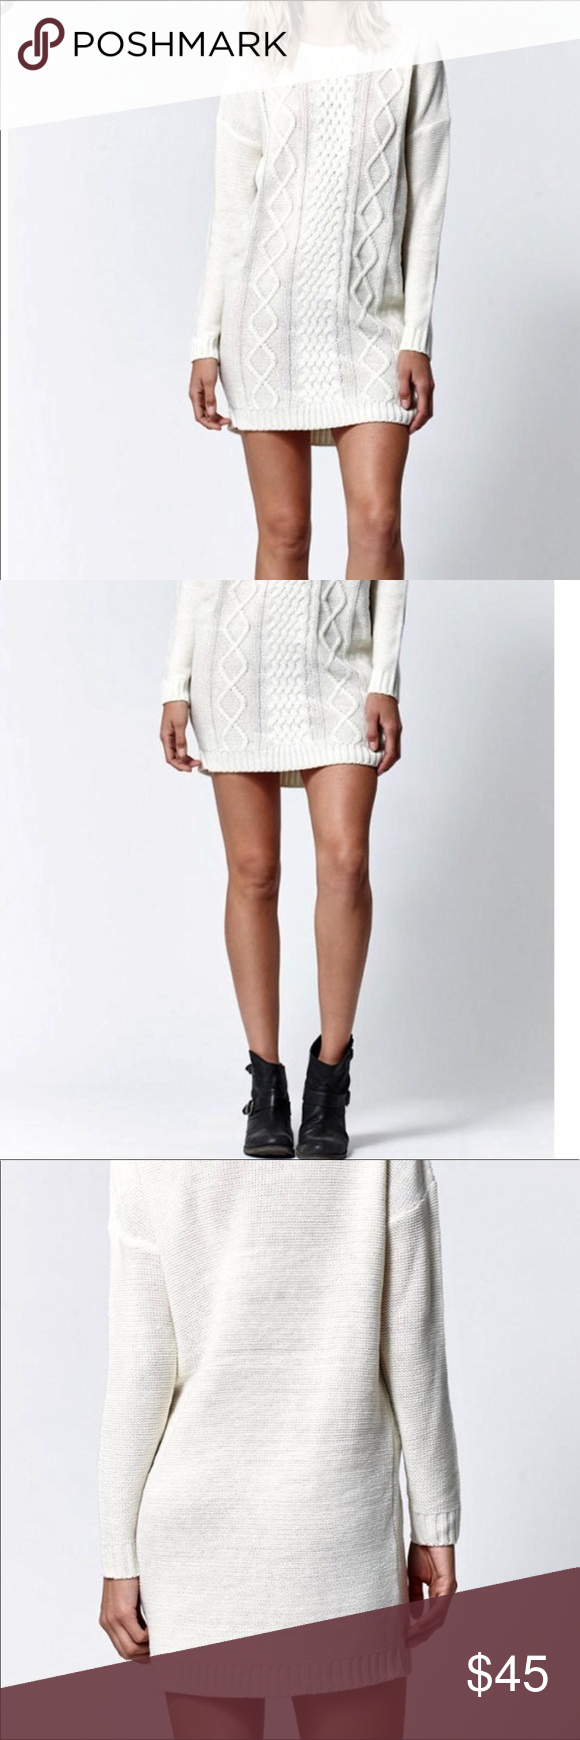 3b645ef8b7c 💫NWT Jack by B.B. Dakota Cable Knit Sweater Dress New With Tags! Jack by